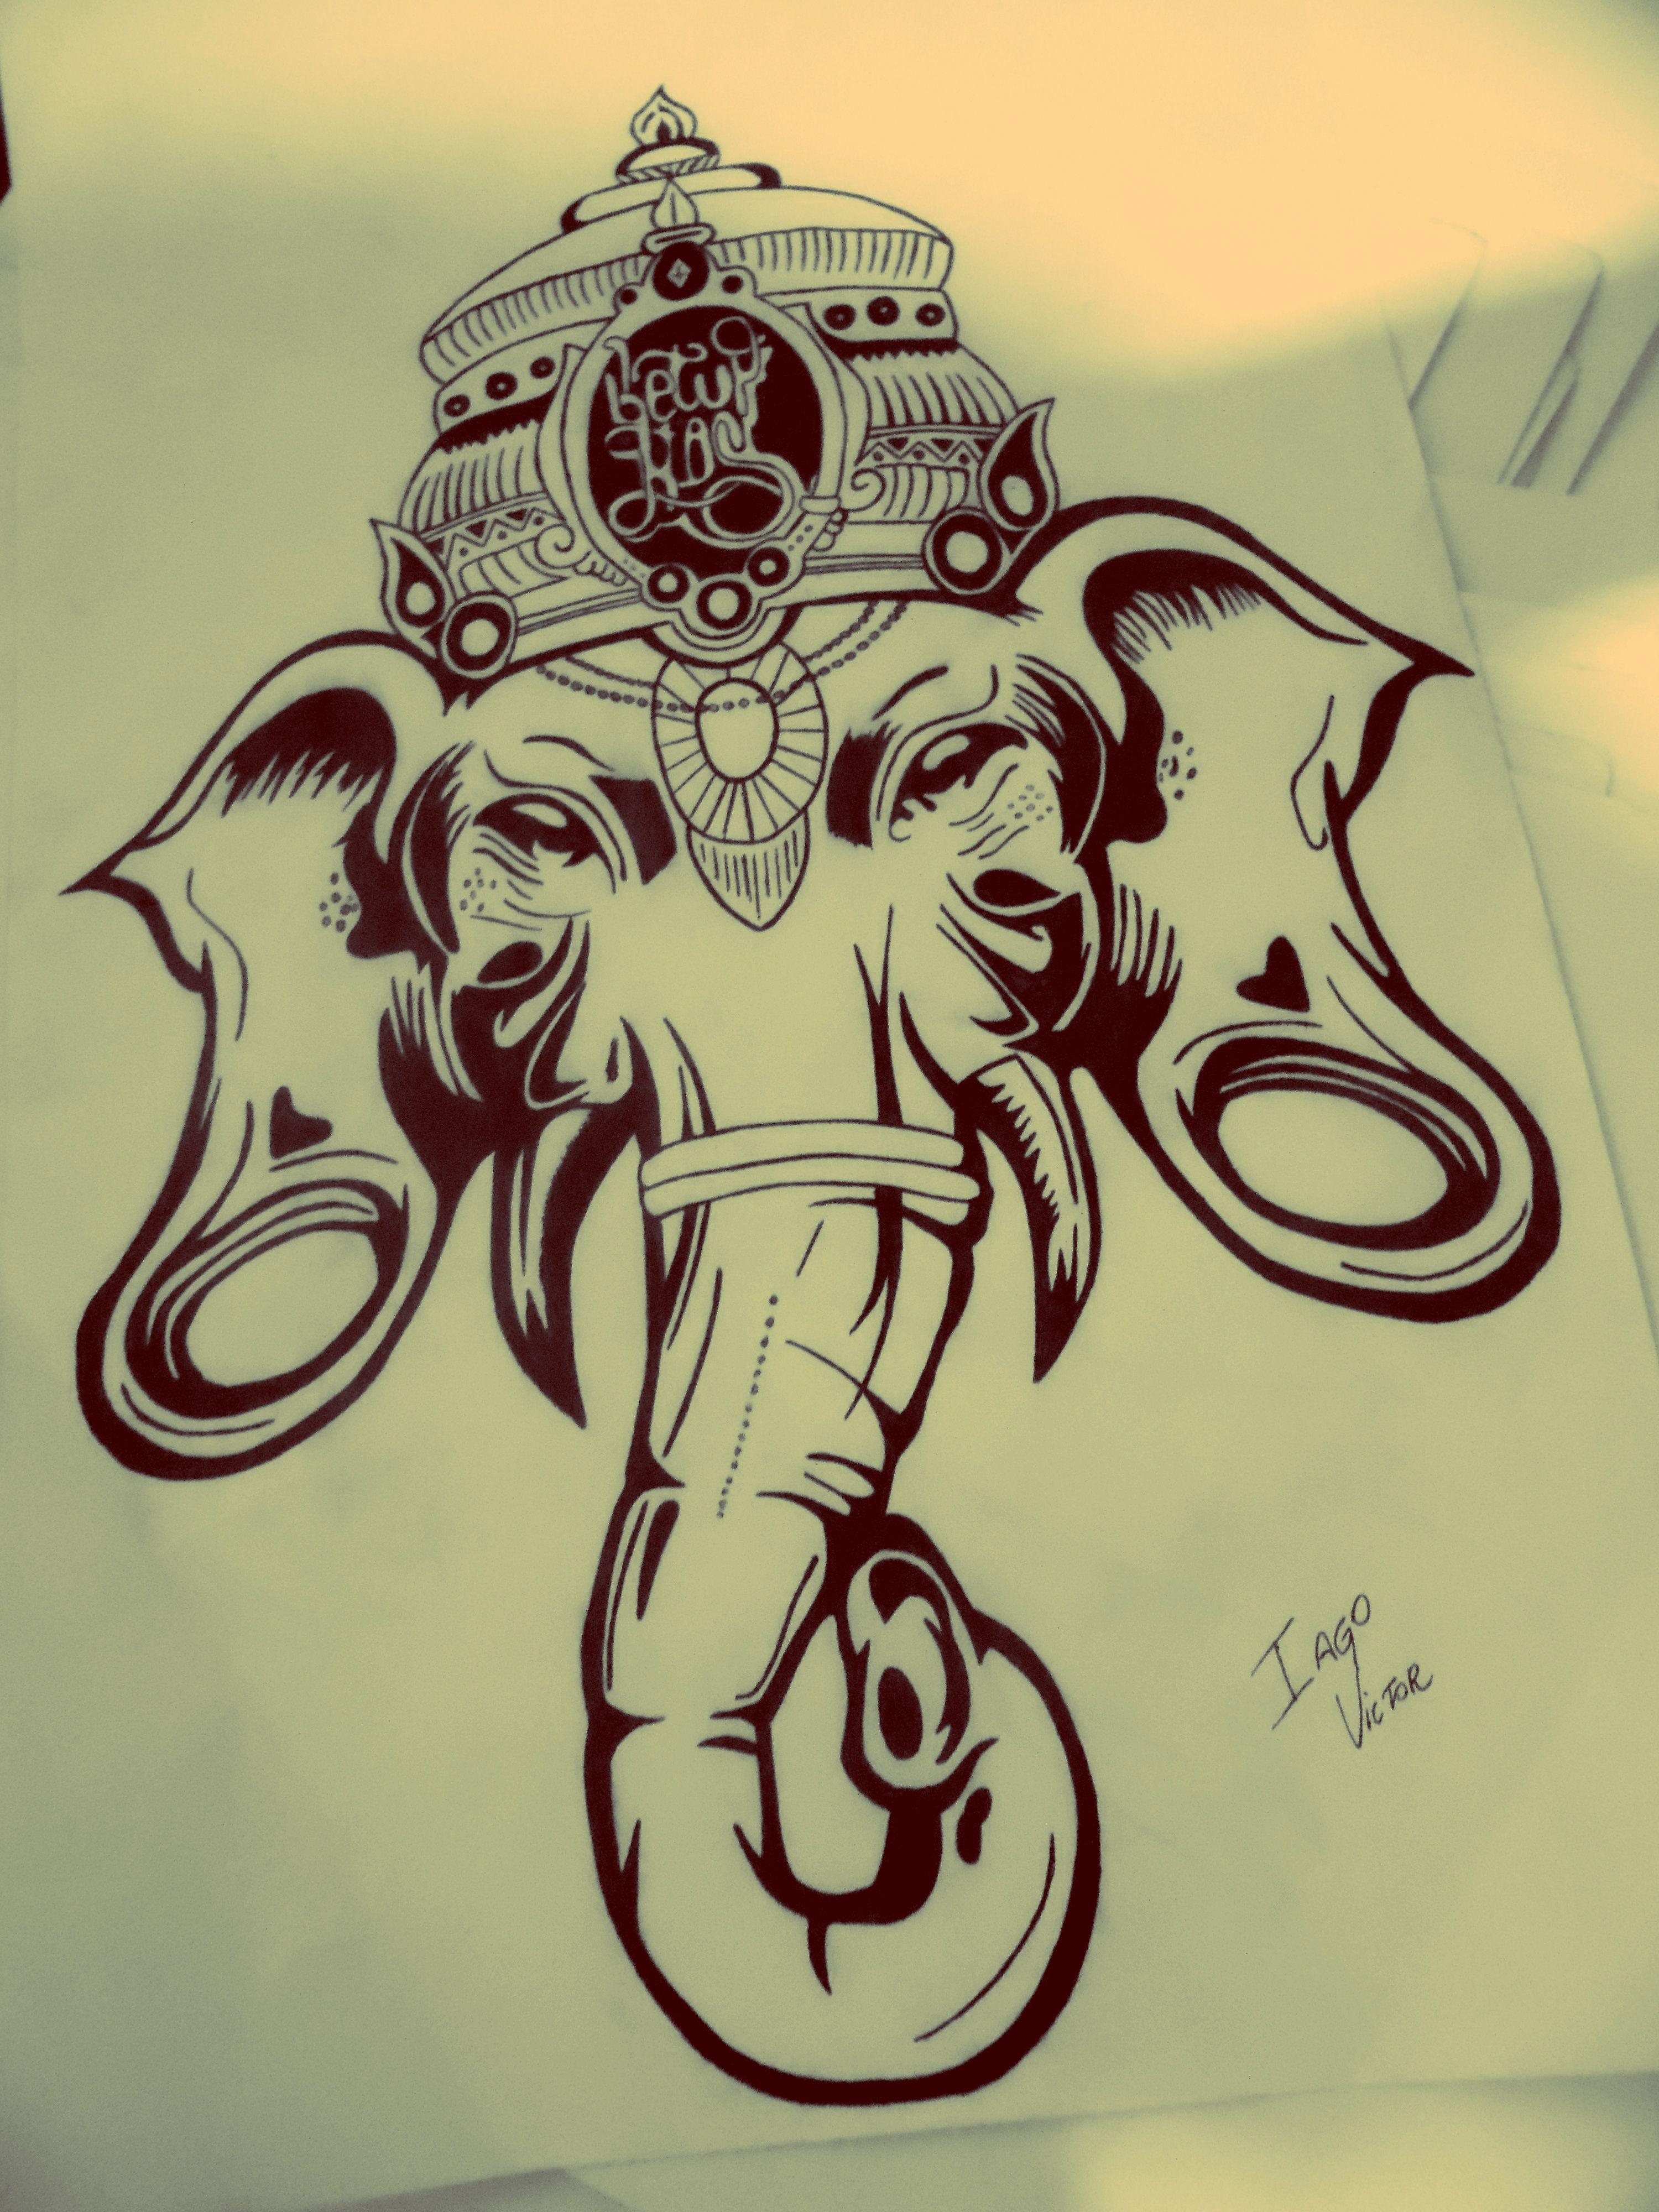 11 ganesha tattoo designs ideas and samples - Ganesha Drawing